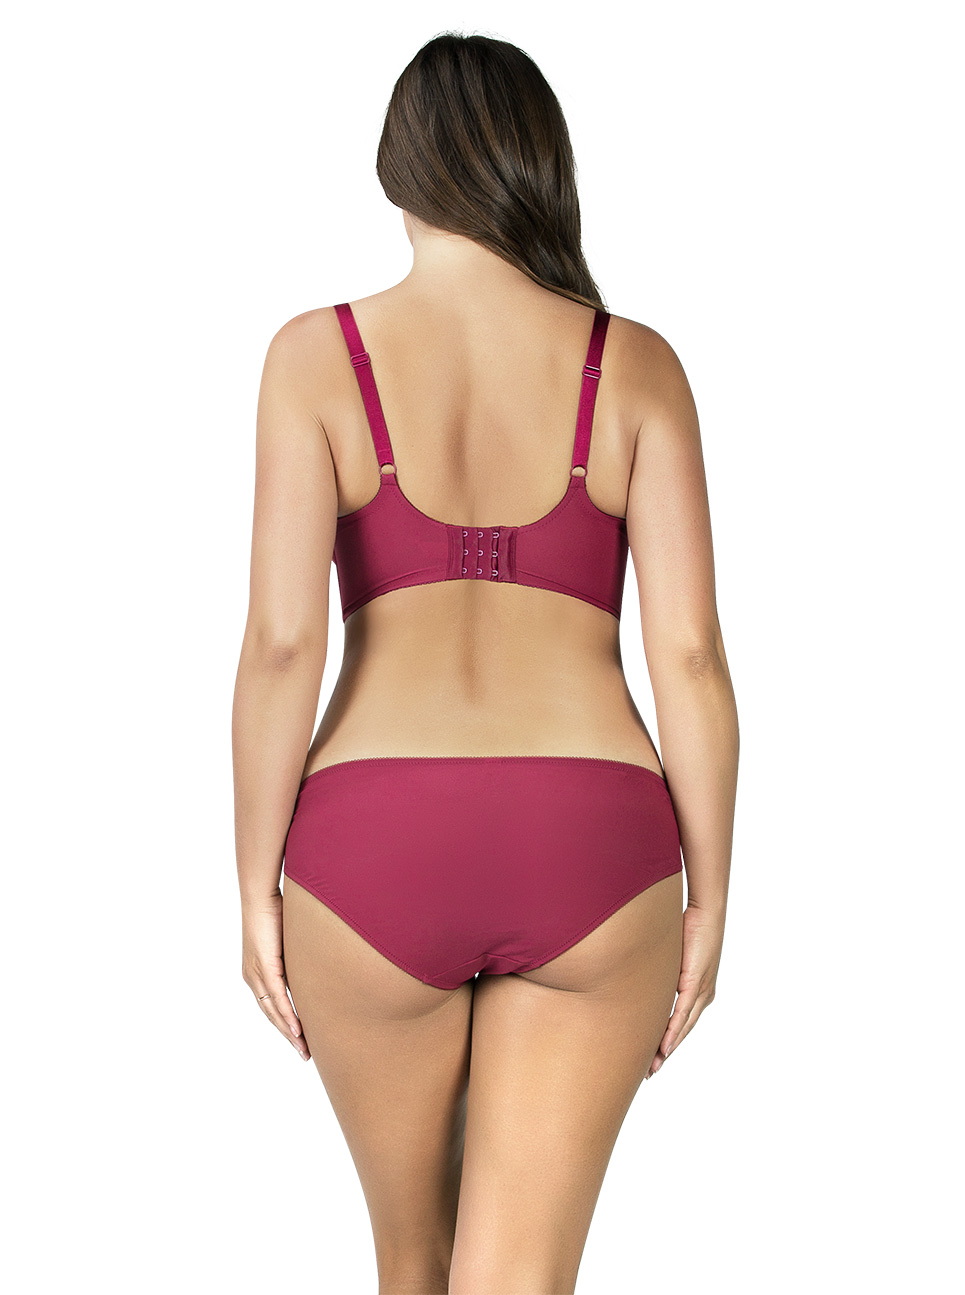 PARFAIT Cora UnlinedLonglineBraP5632 BikiniP5633 Crimson Back - Cora Unlined Longline Bra Crimson P5632